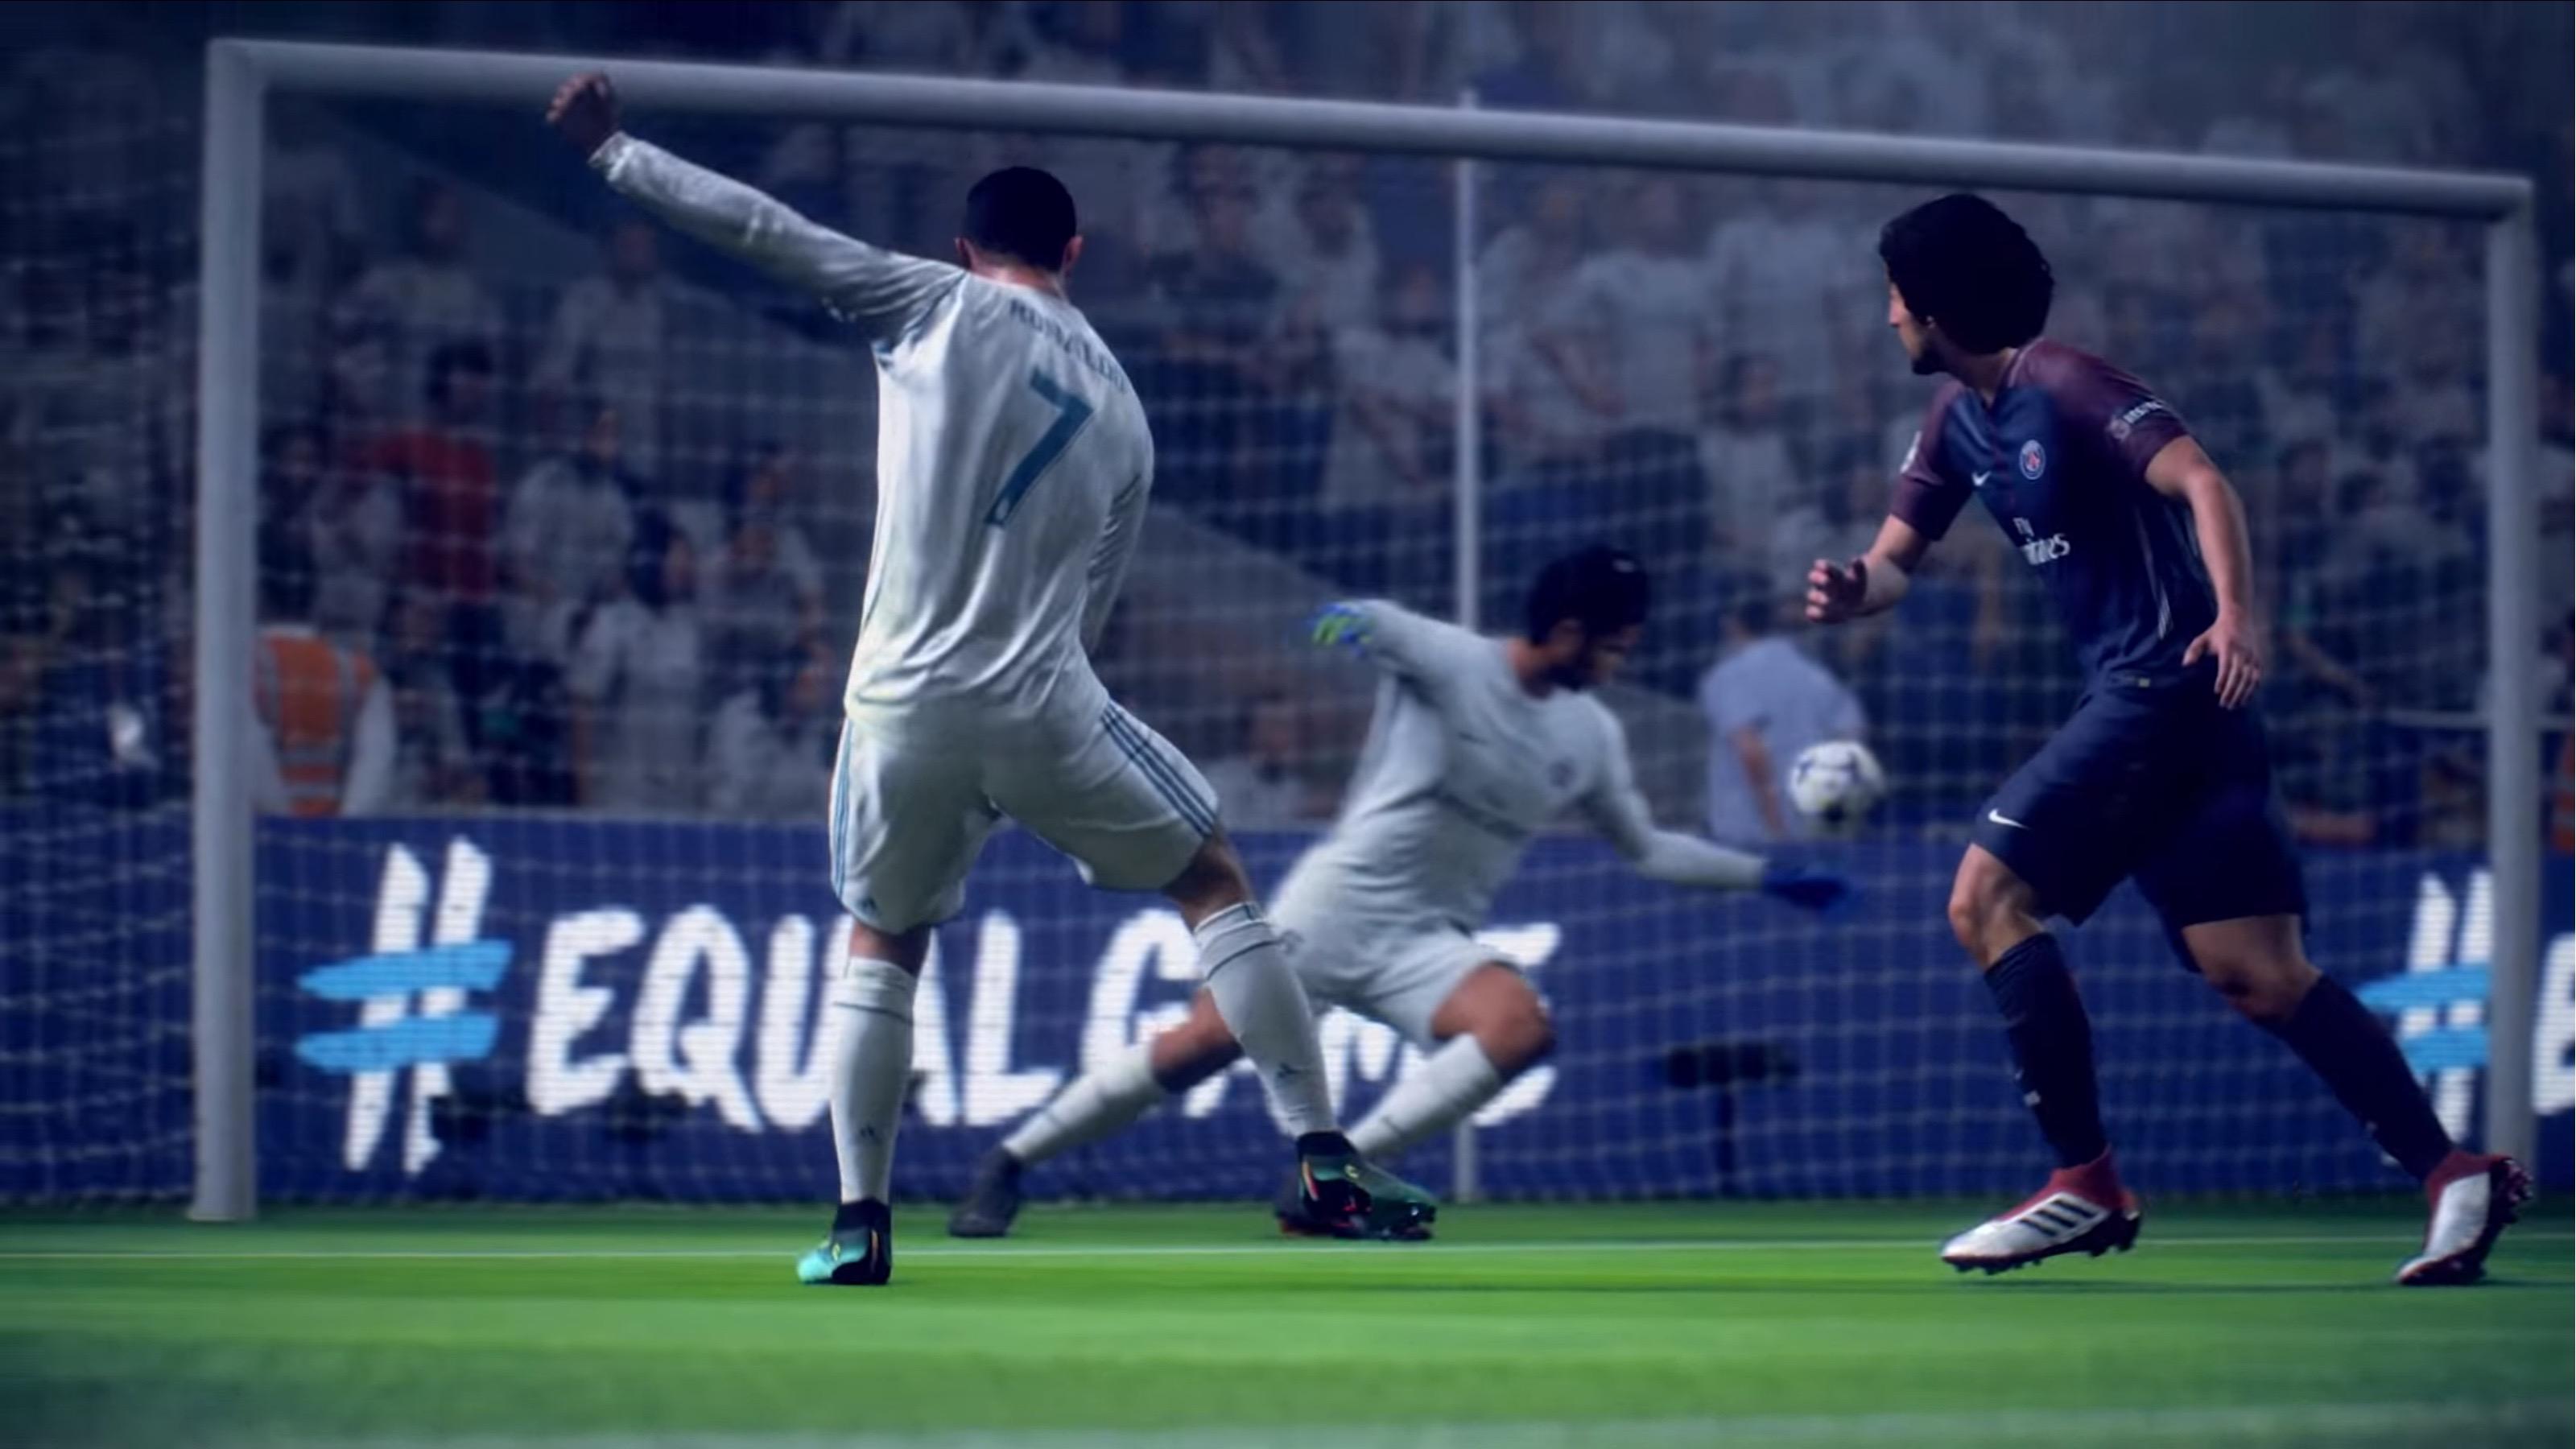 FIFA 20: release date, news, BLByF9wZax6y9jrGPp4b